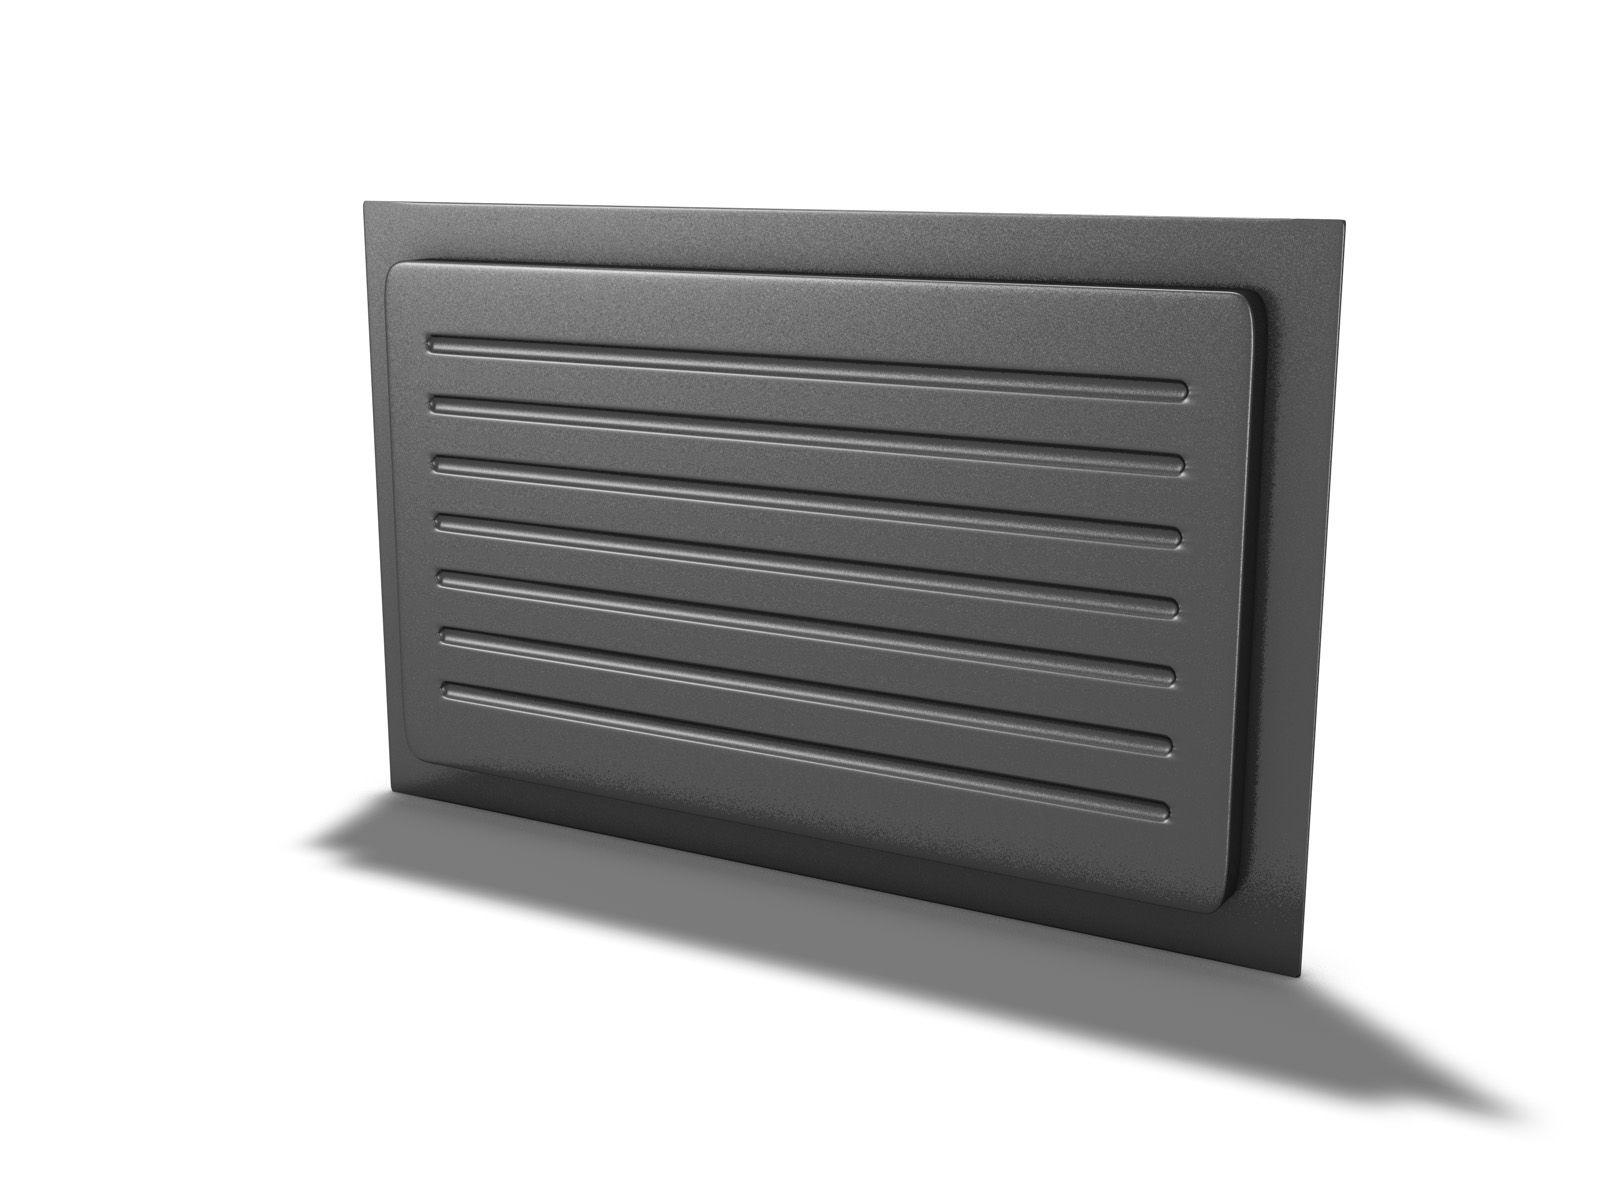 Flood Vents And Air Vents Crawlspace Door Systems Vent Covers Crawl Space Vent Covers Crawlspace